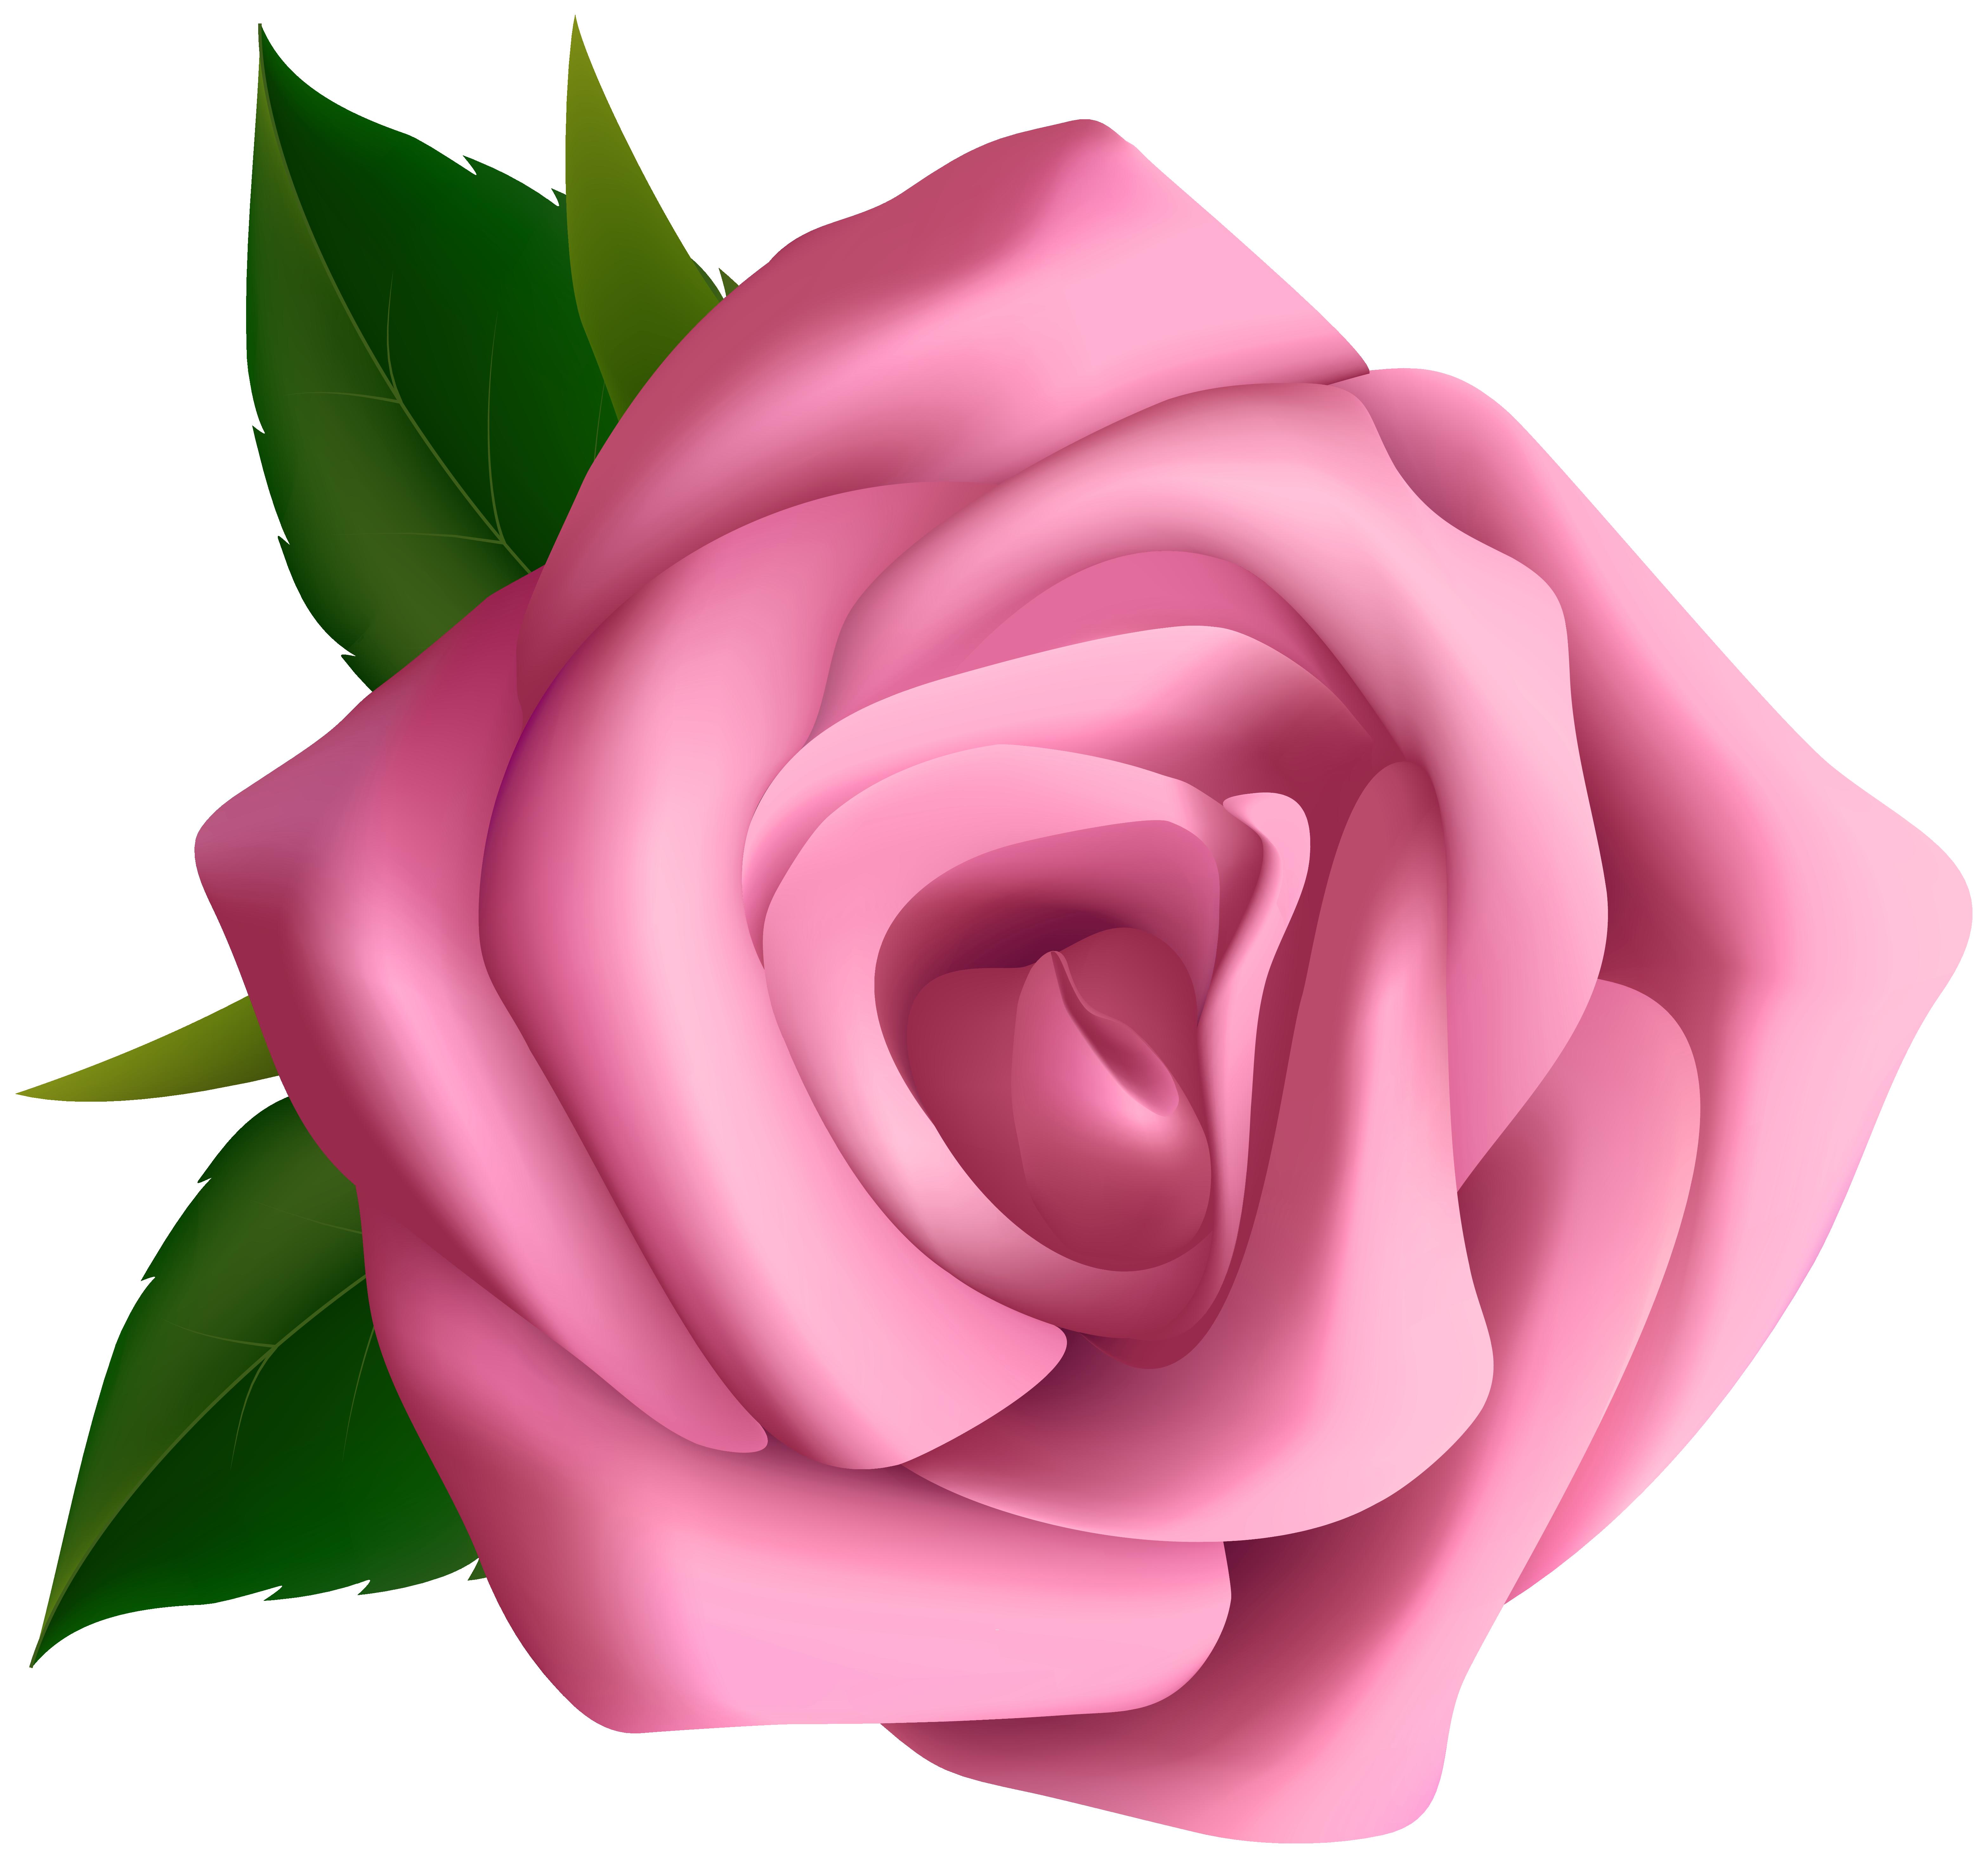 Large Pink Rose Clipart Blumen Pink Rose-Large pink rose clipart blumen pink roses clip cliparting-8